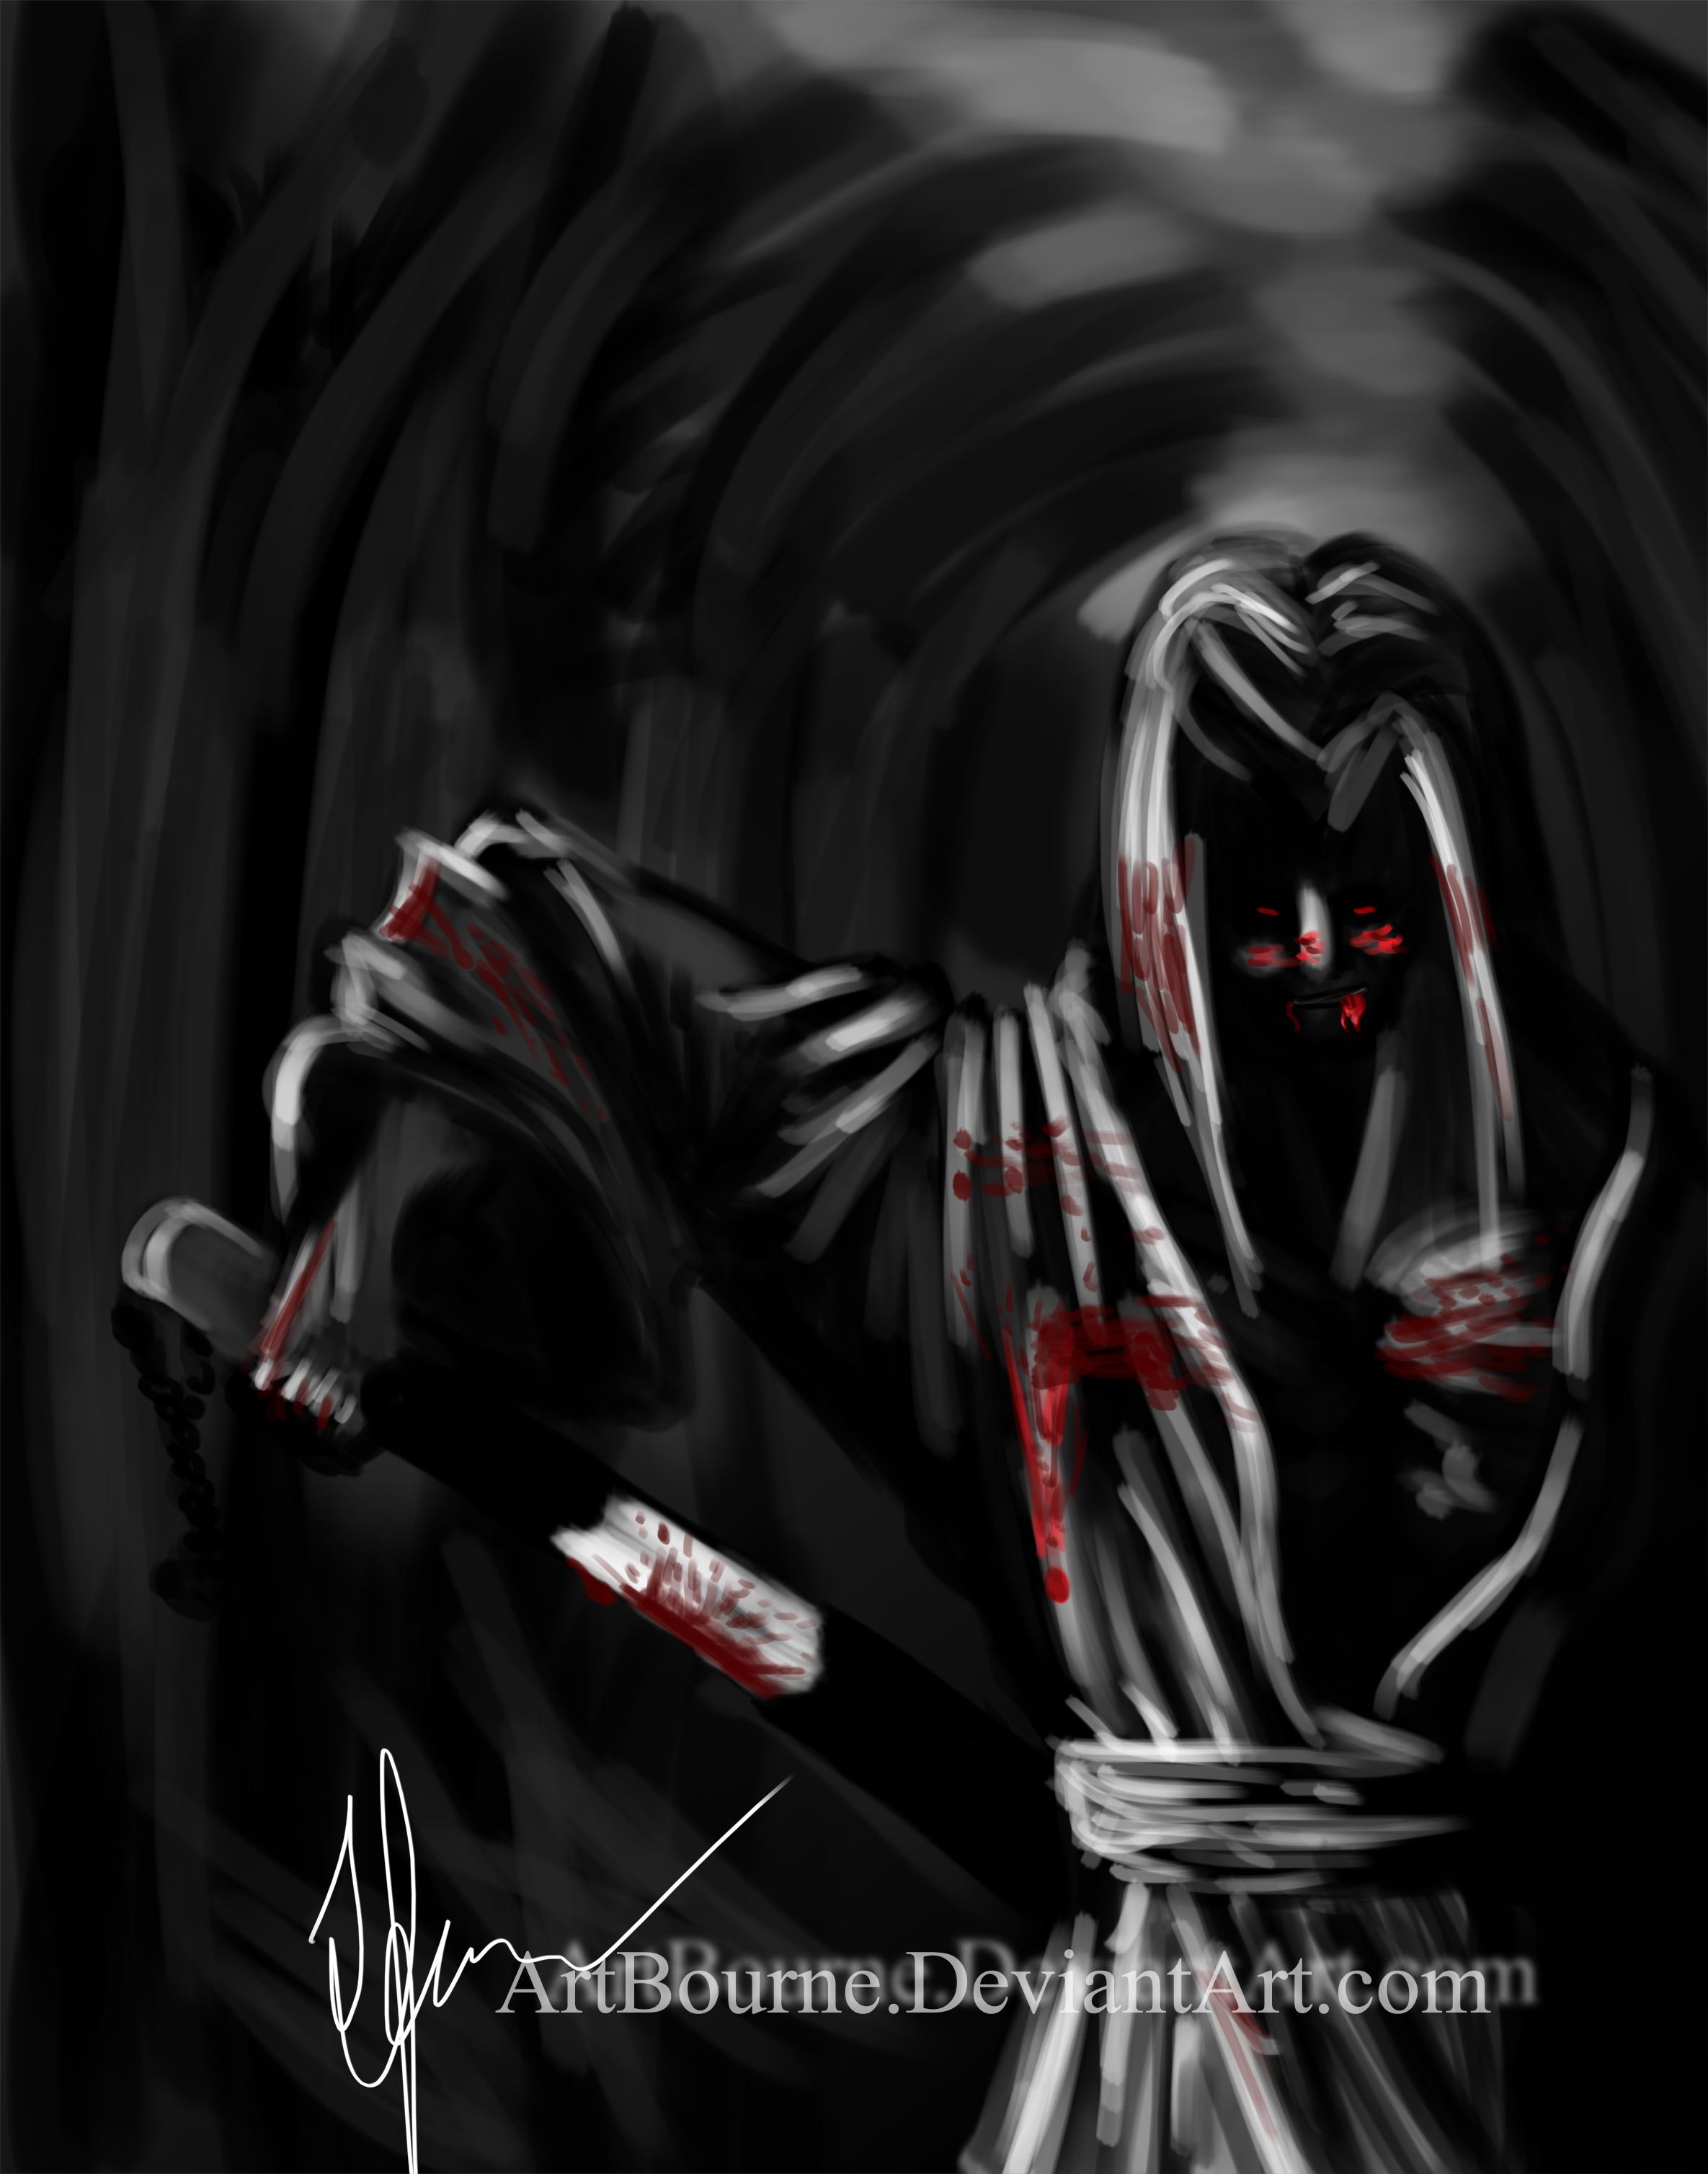 Idris-Hell's Swordsman